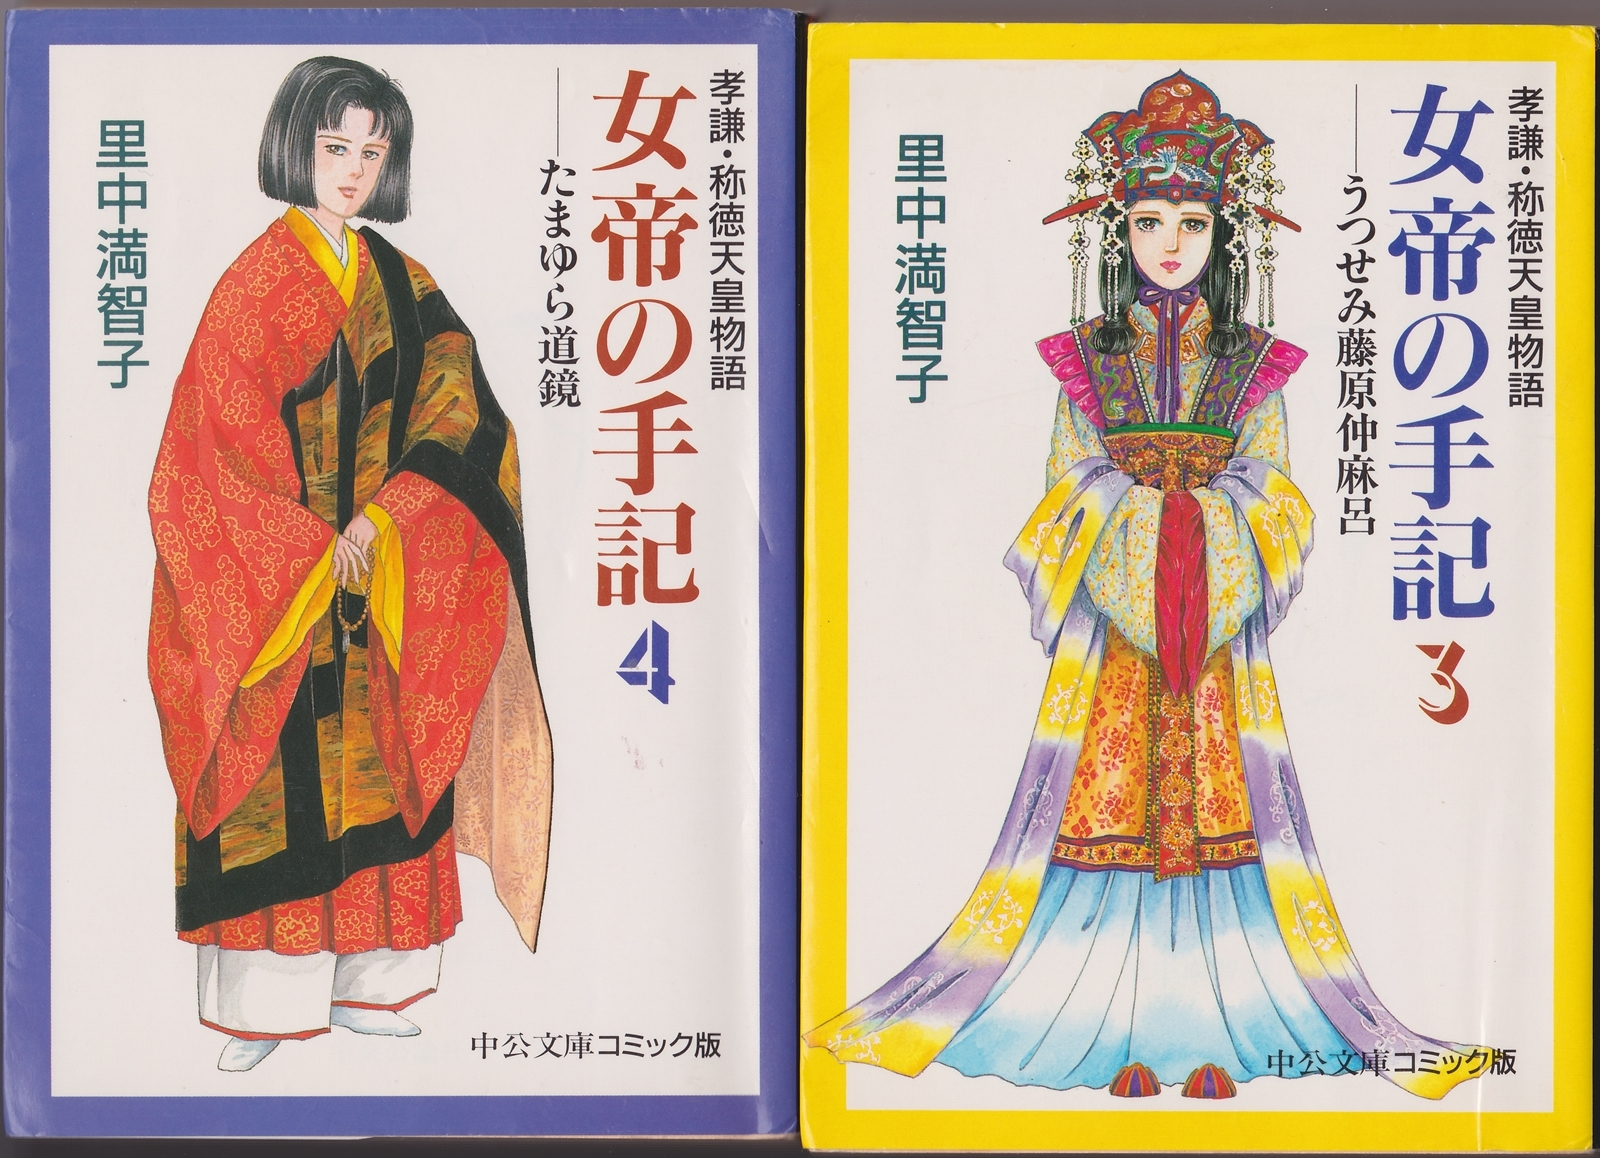 Jotei-no-shuki-cover34.jpg